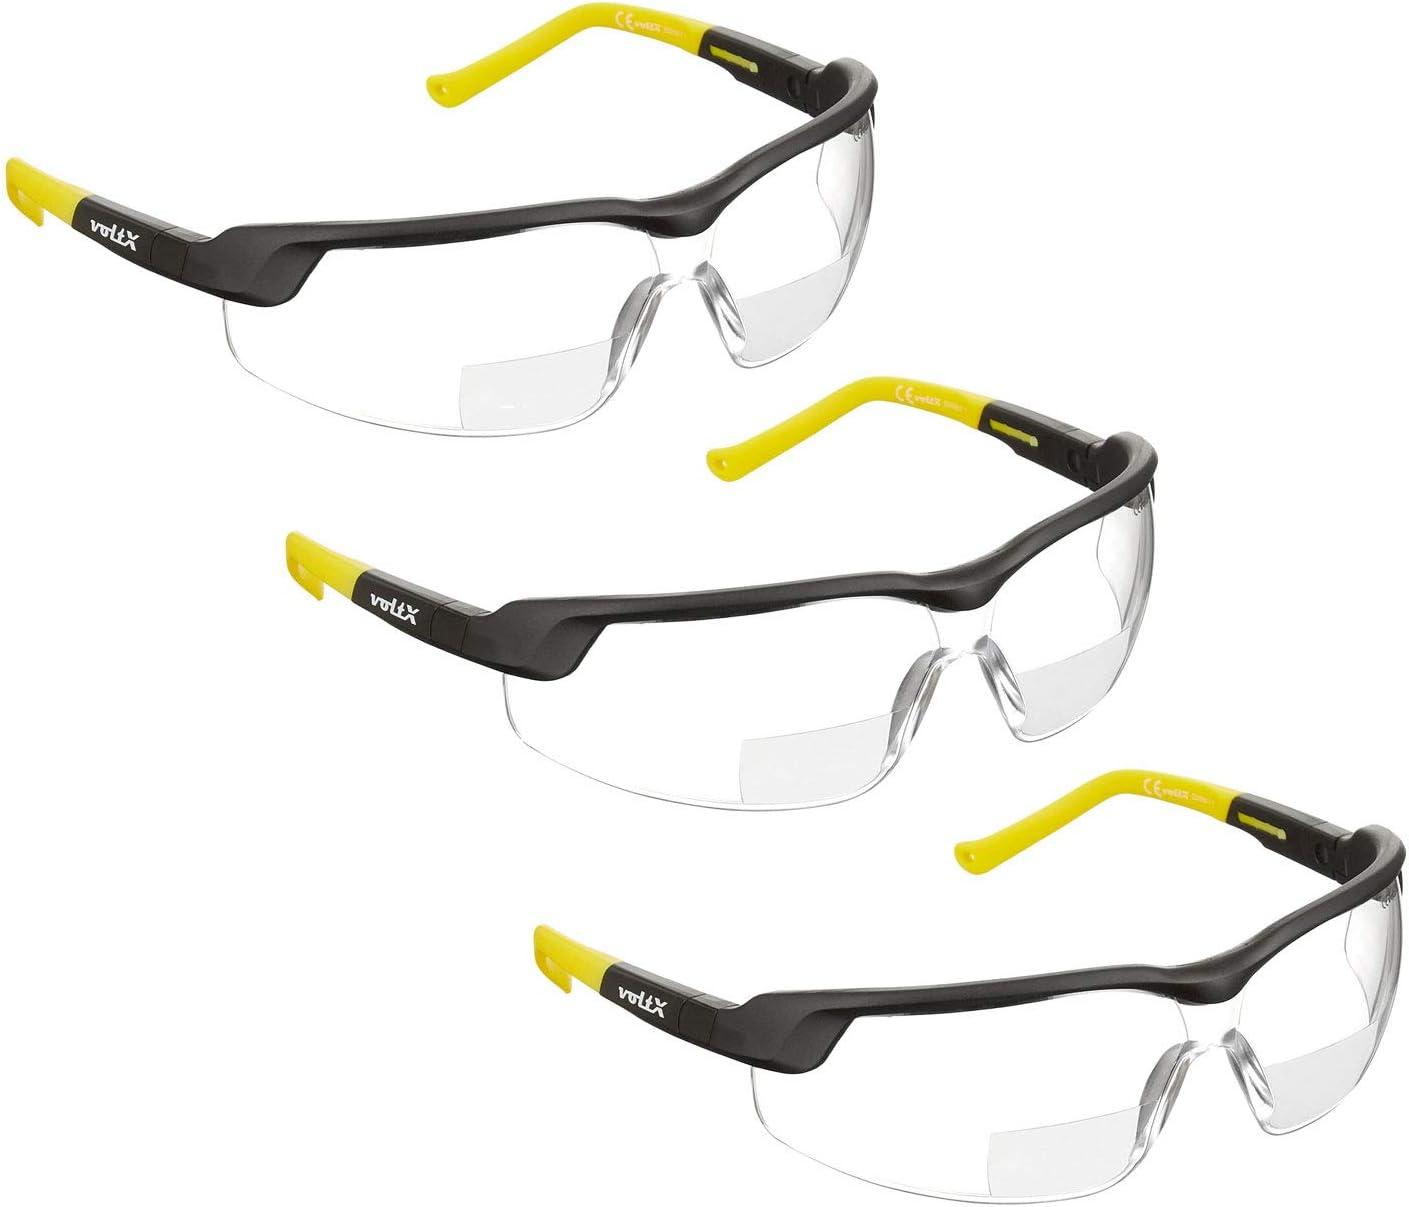 2020 model Scratch resistant Bifocal Reading Safety Glasses UV400 Lens Clear Lens +3.0 voltX GT ADJUSTABLE Rigid Clamshell Safety Case. CE EN166FT Certified Anti fog coated